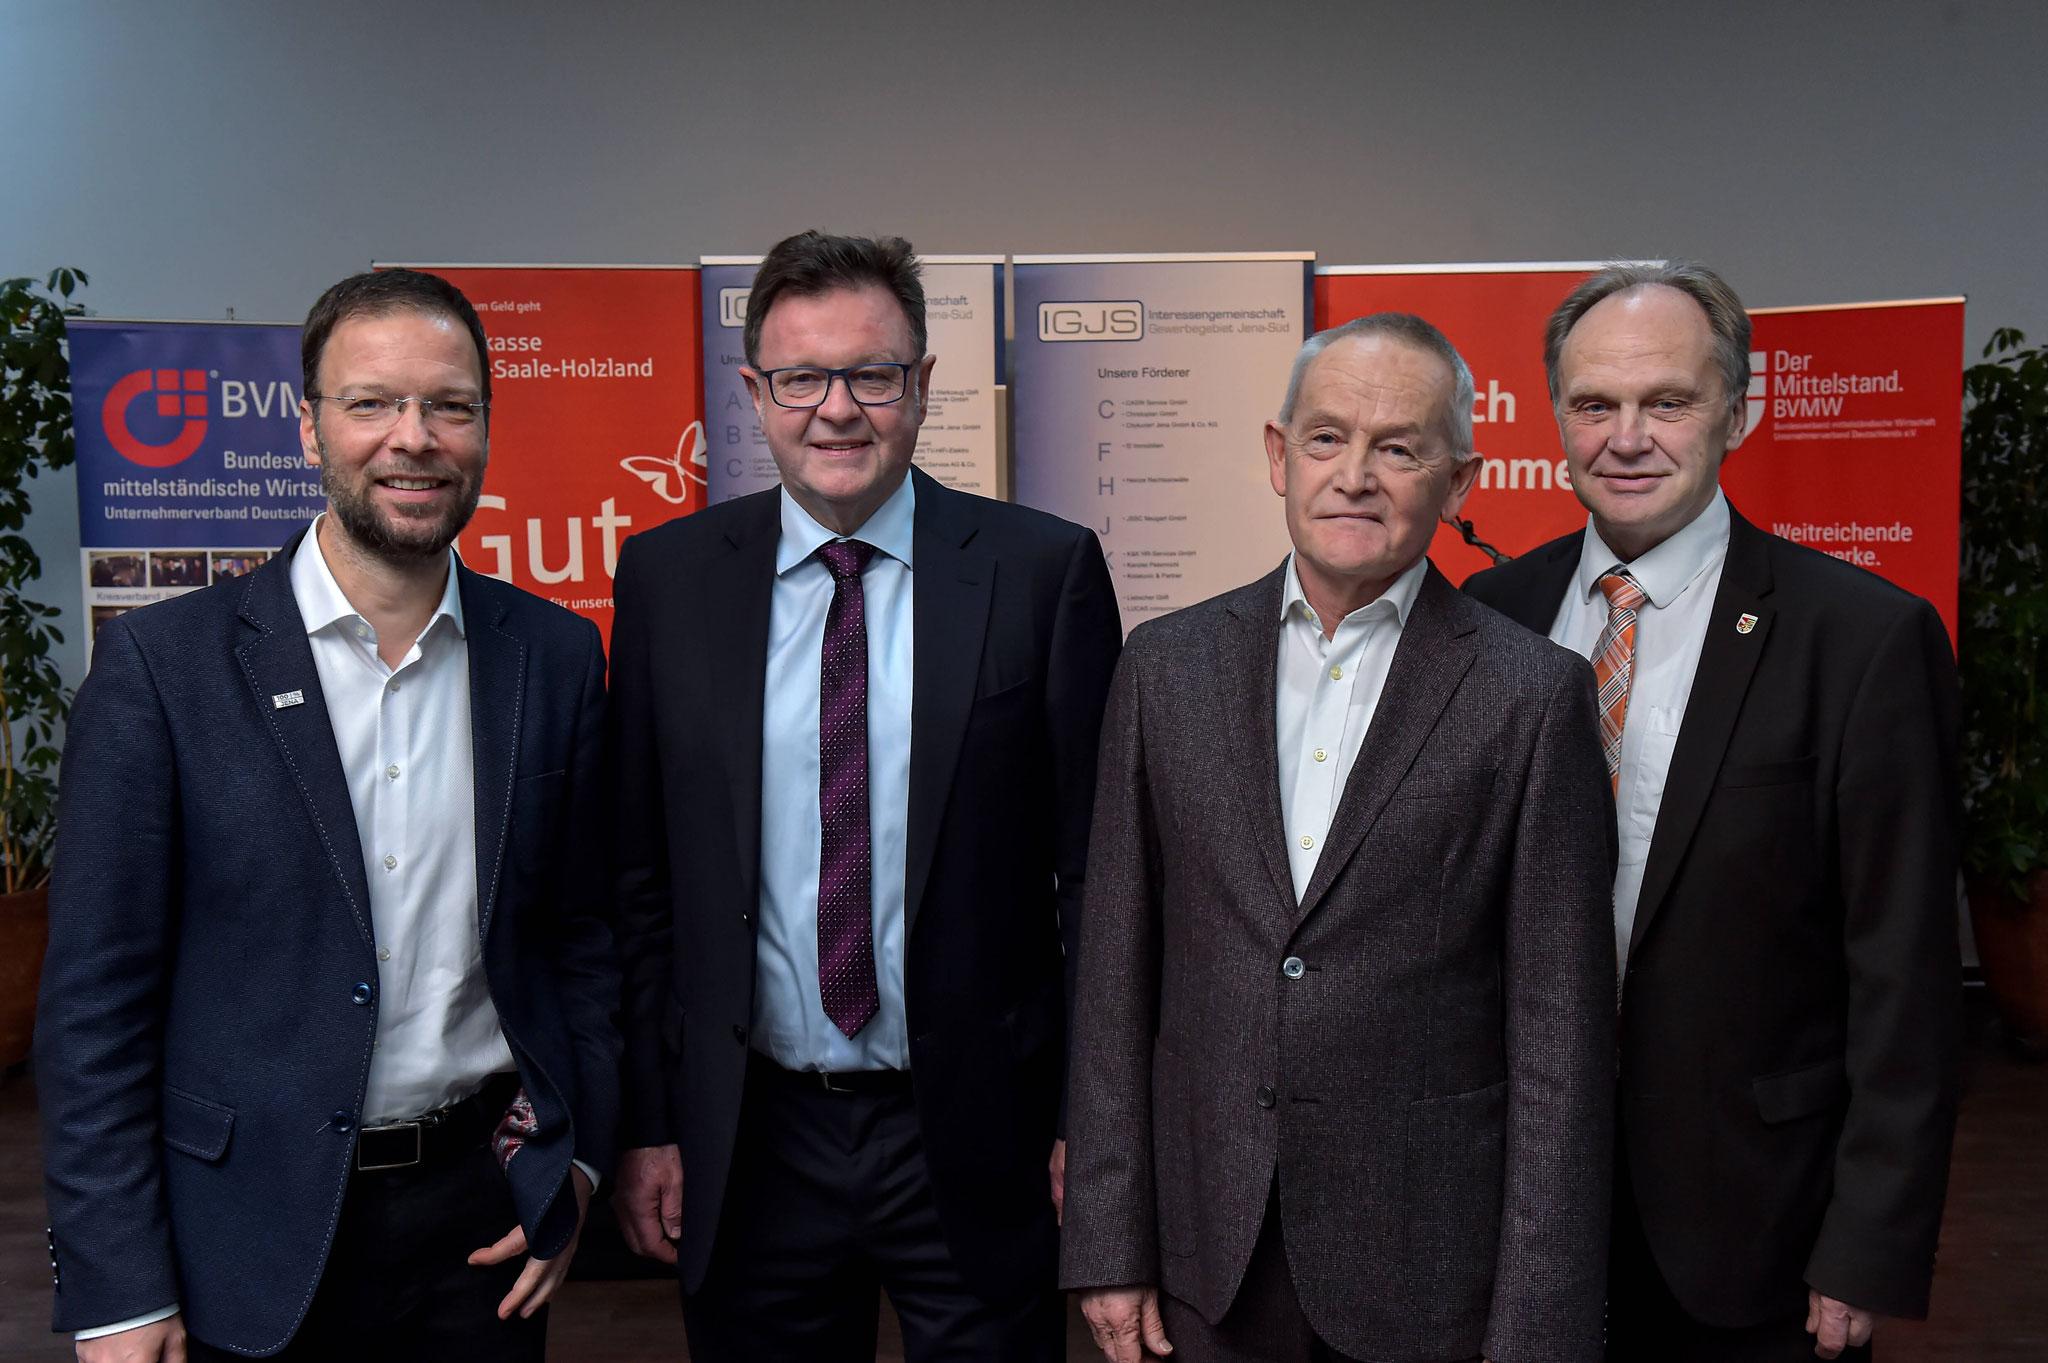 v.l.n.r.:  Dr. Thomas Nitzsche (OB Jena), Frank Heuer (Vorstandssprecher IGJS), Prof. Evehard Holtmann (Gastredner) und Andreas Heller (Landrat Saale-Holzland-Kreis)